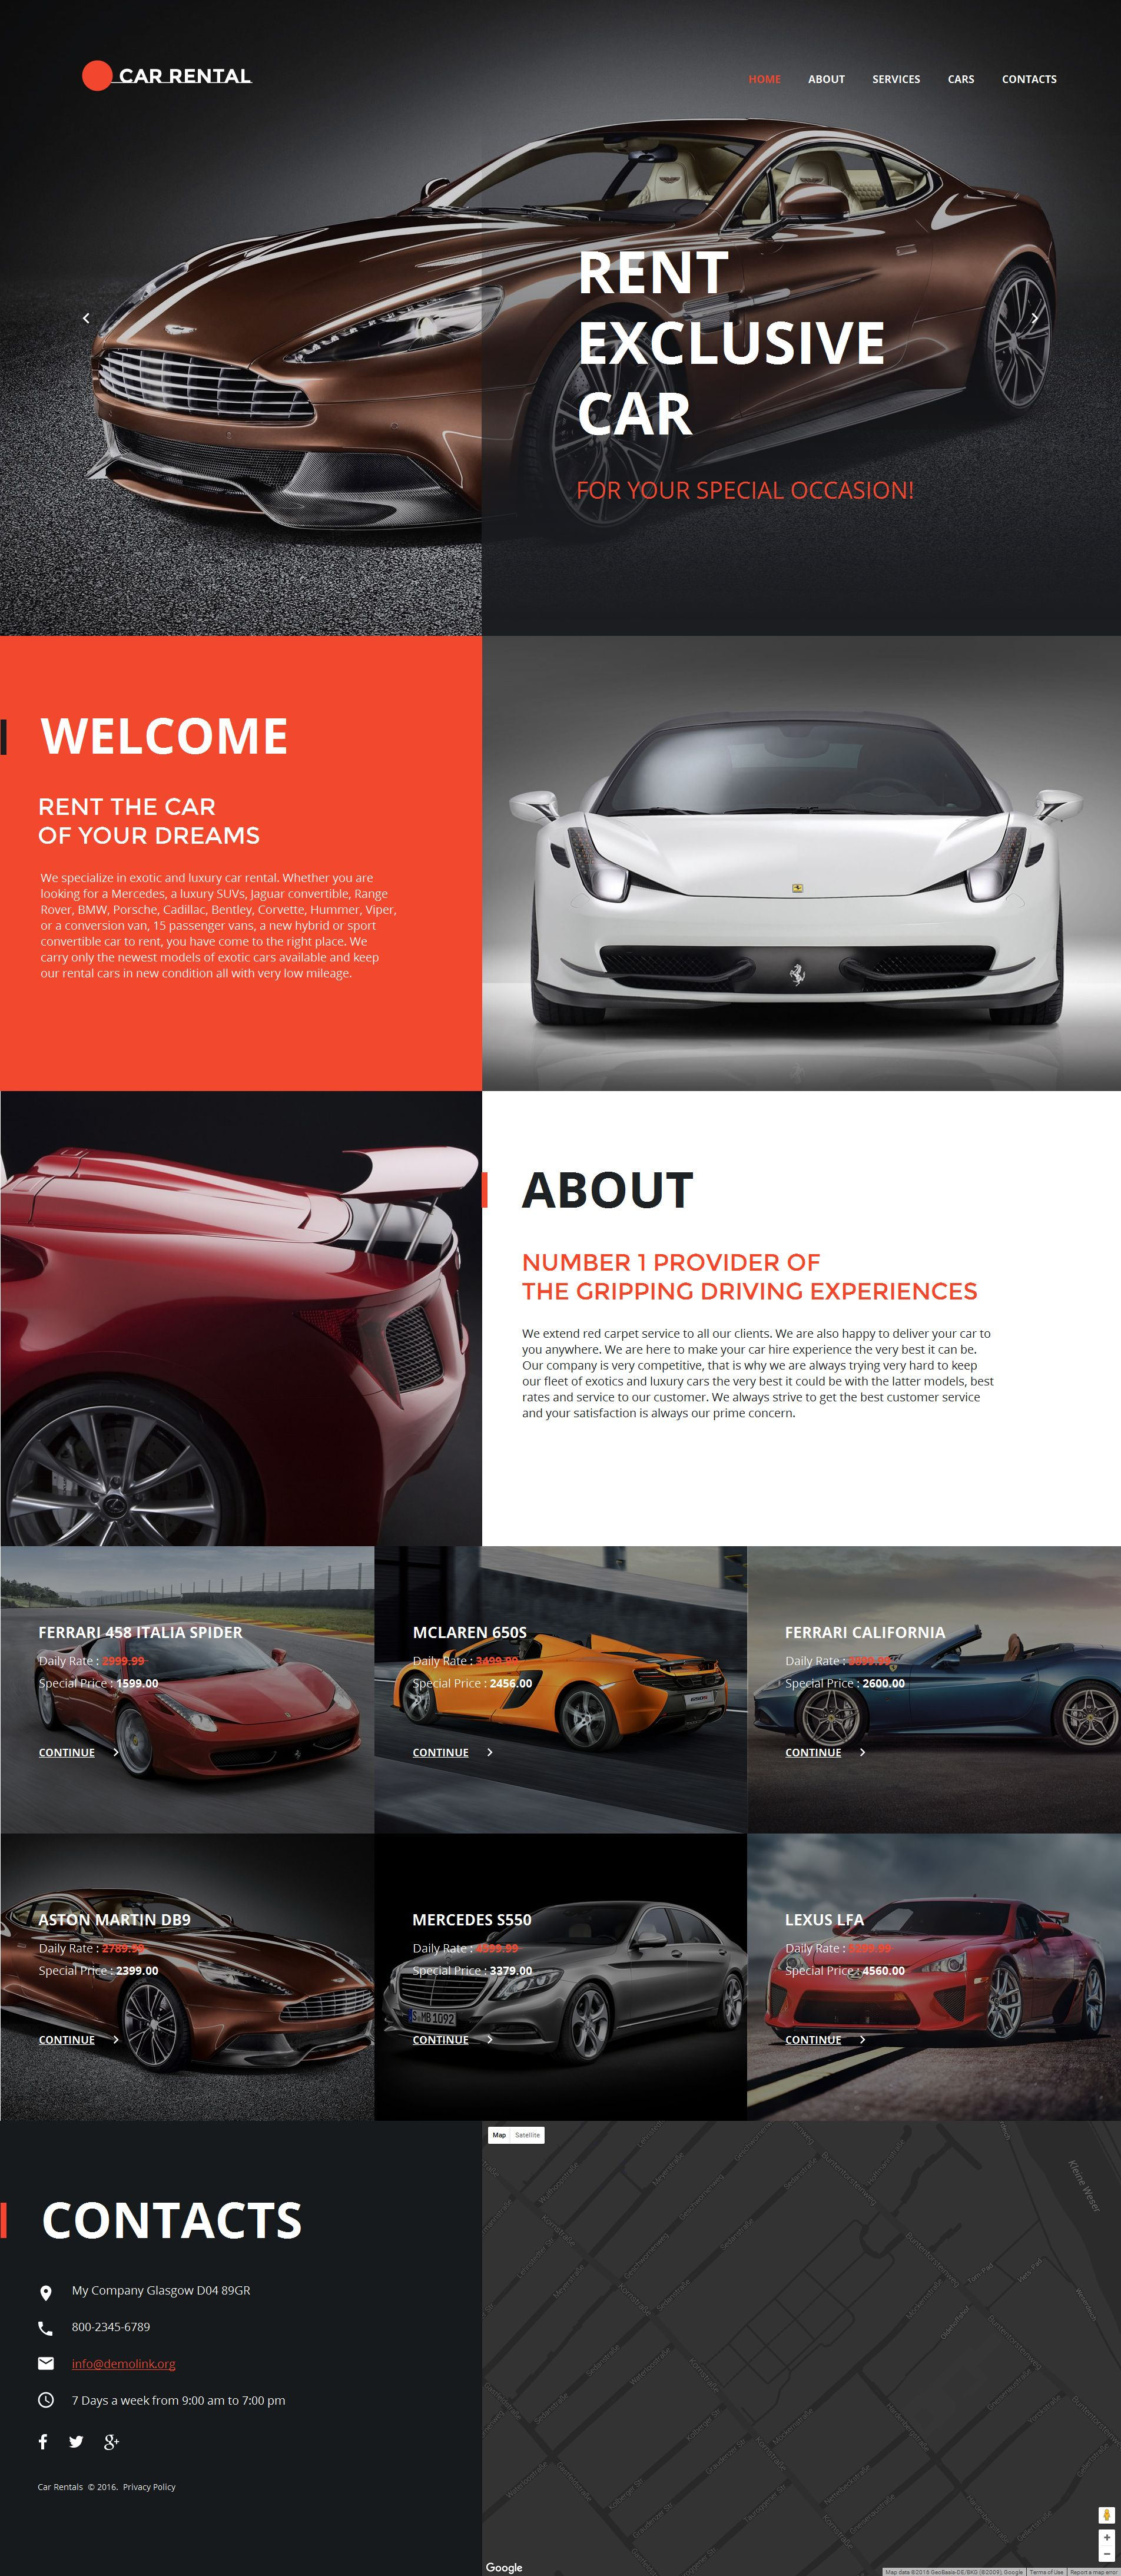 Car Rental Moto CMS HTML Template #58747